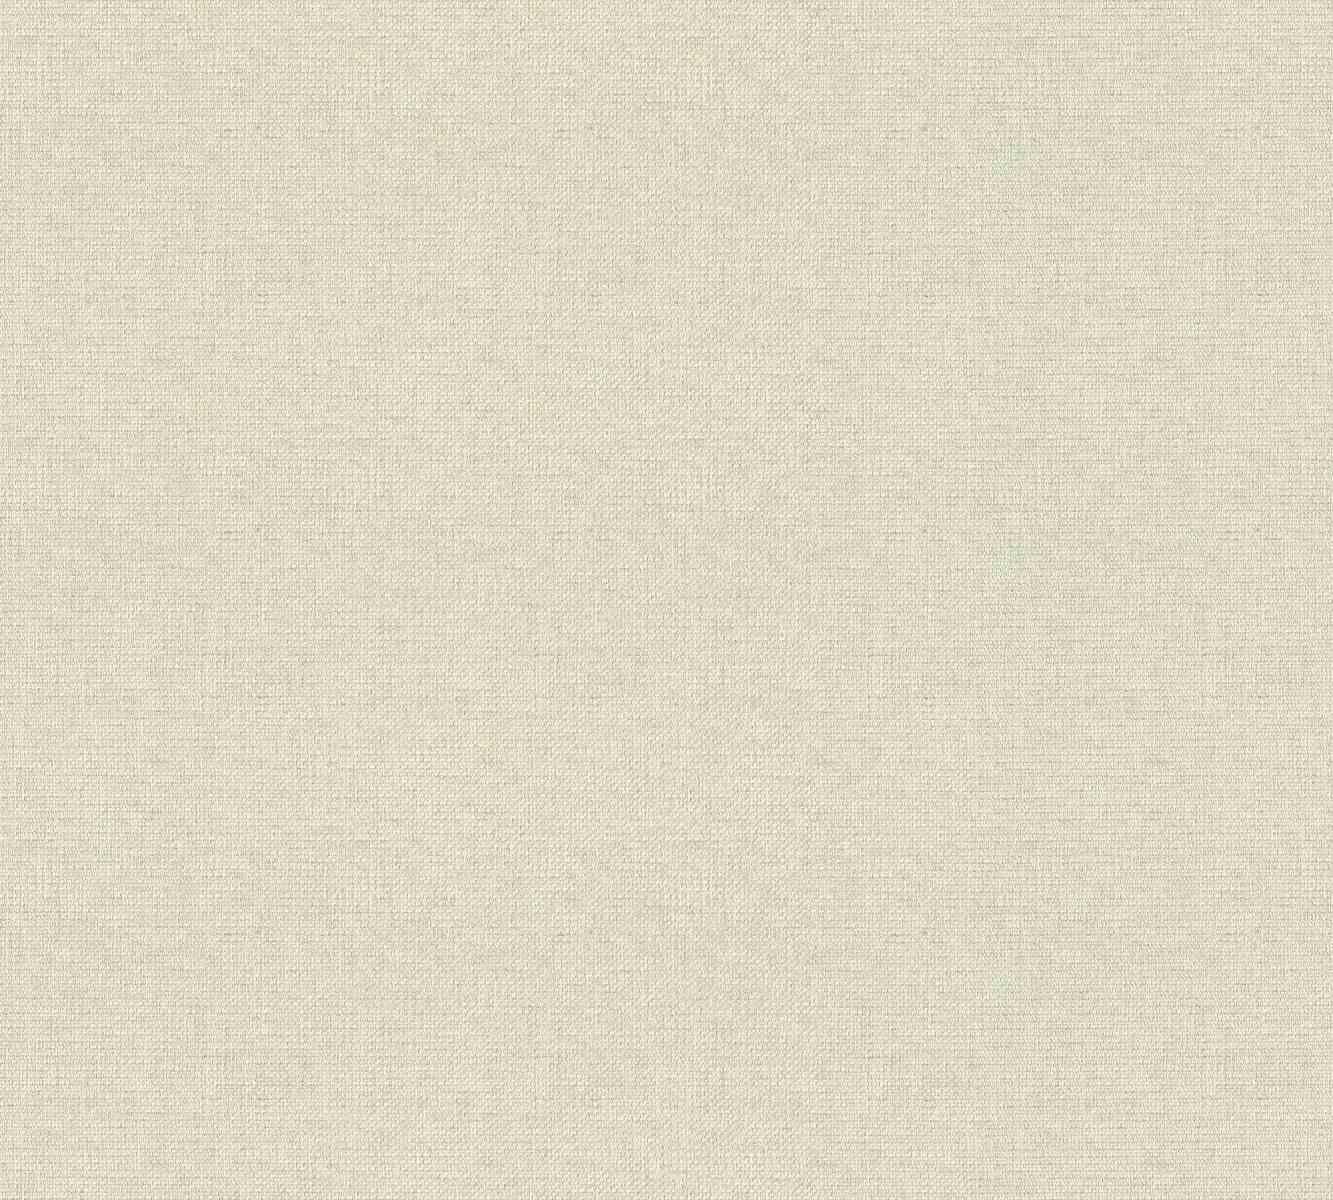 mystique plain colour wall paper beige green metallic 324243